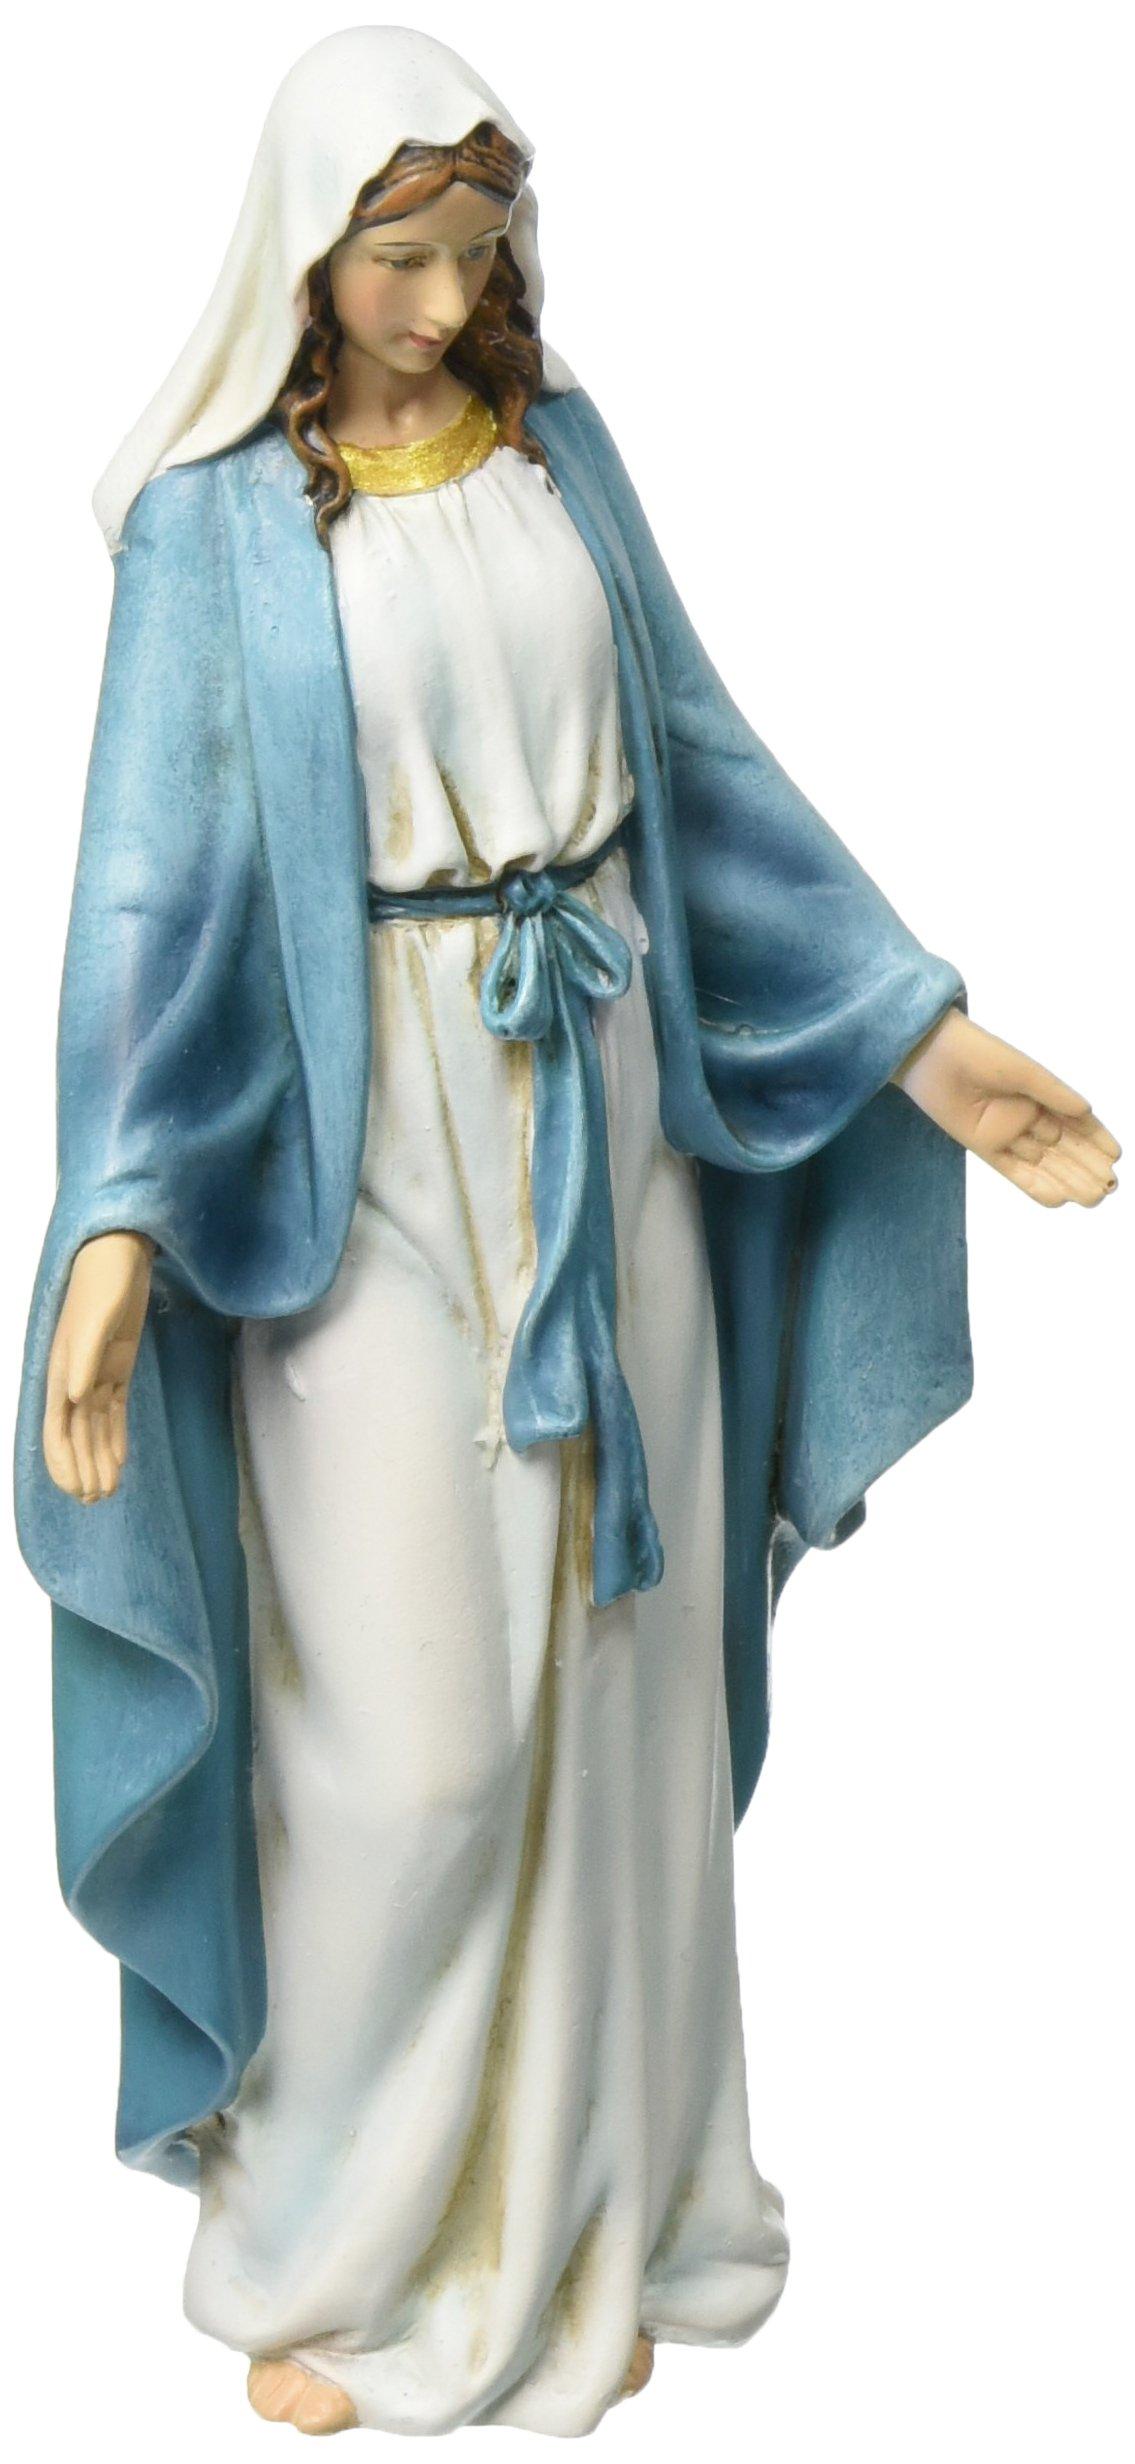 Renaissance Collection Joseph's Studio by Roman Exclusive Our Lady of Grace Figurine, 6-Inch (60686)